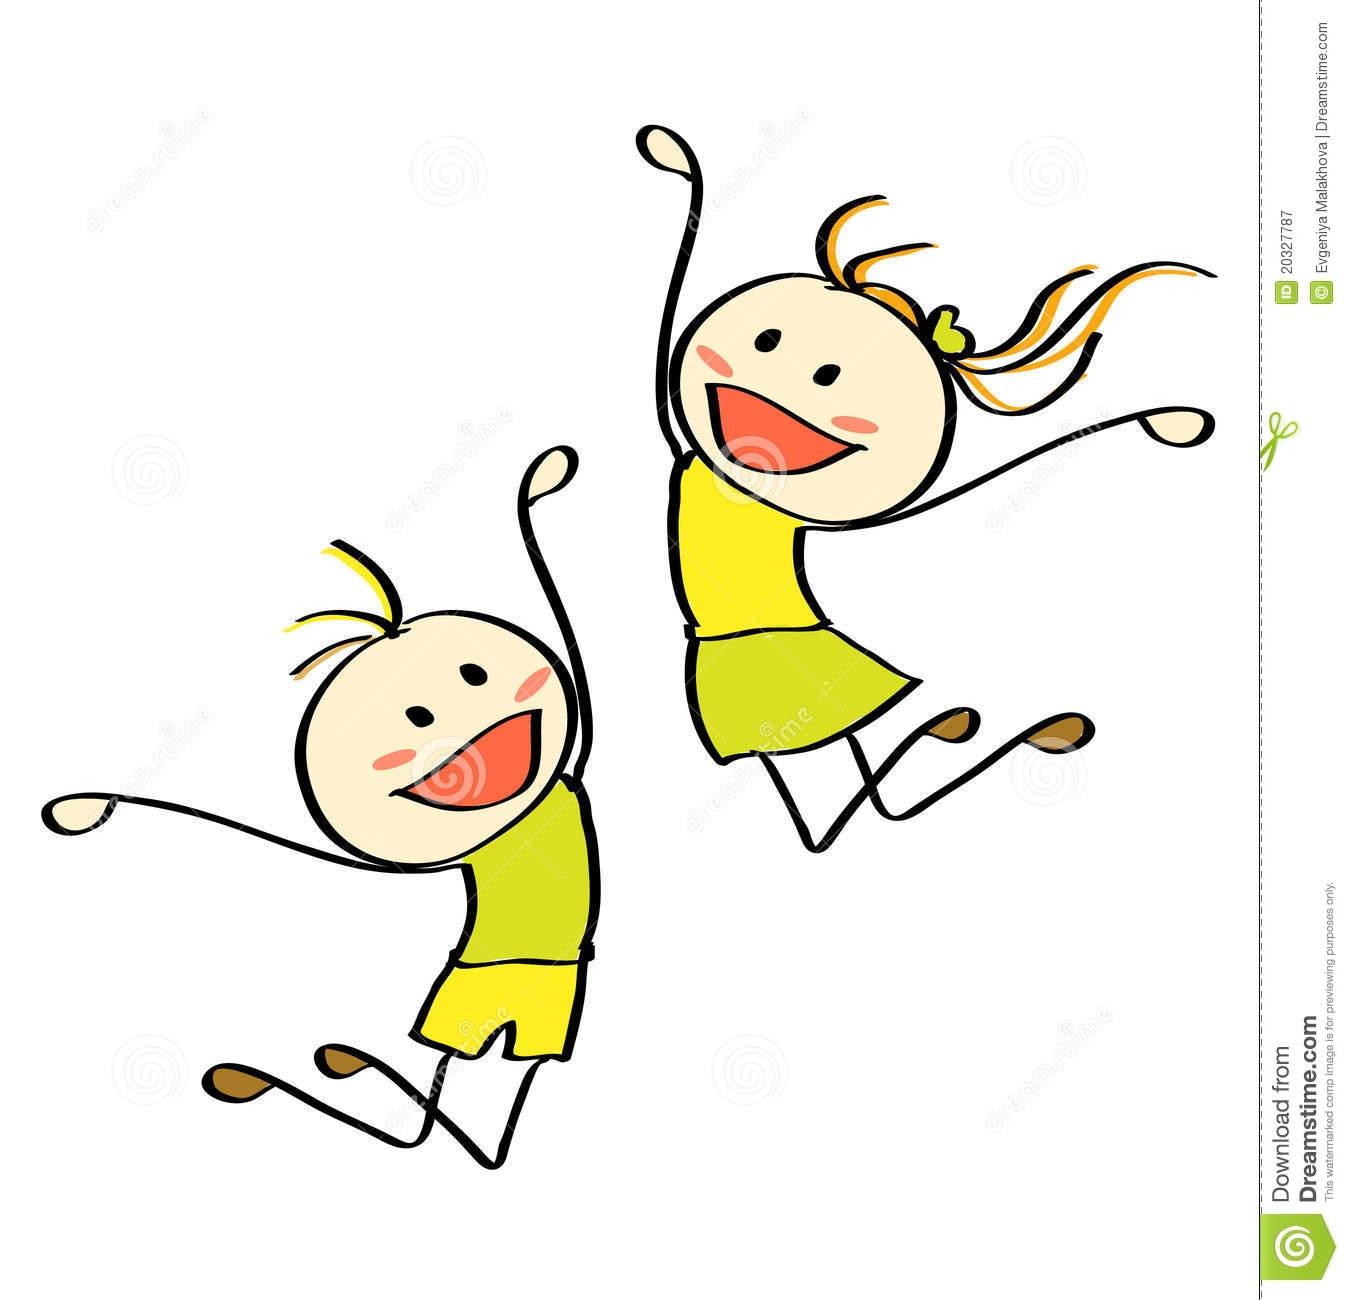 Jumping Kids Royalty Free .-Jumping Kids Royalty Free .-12